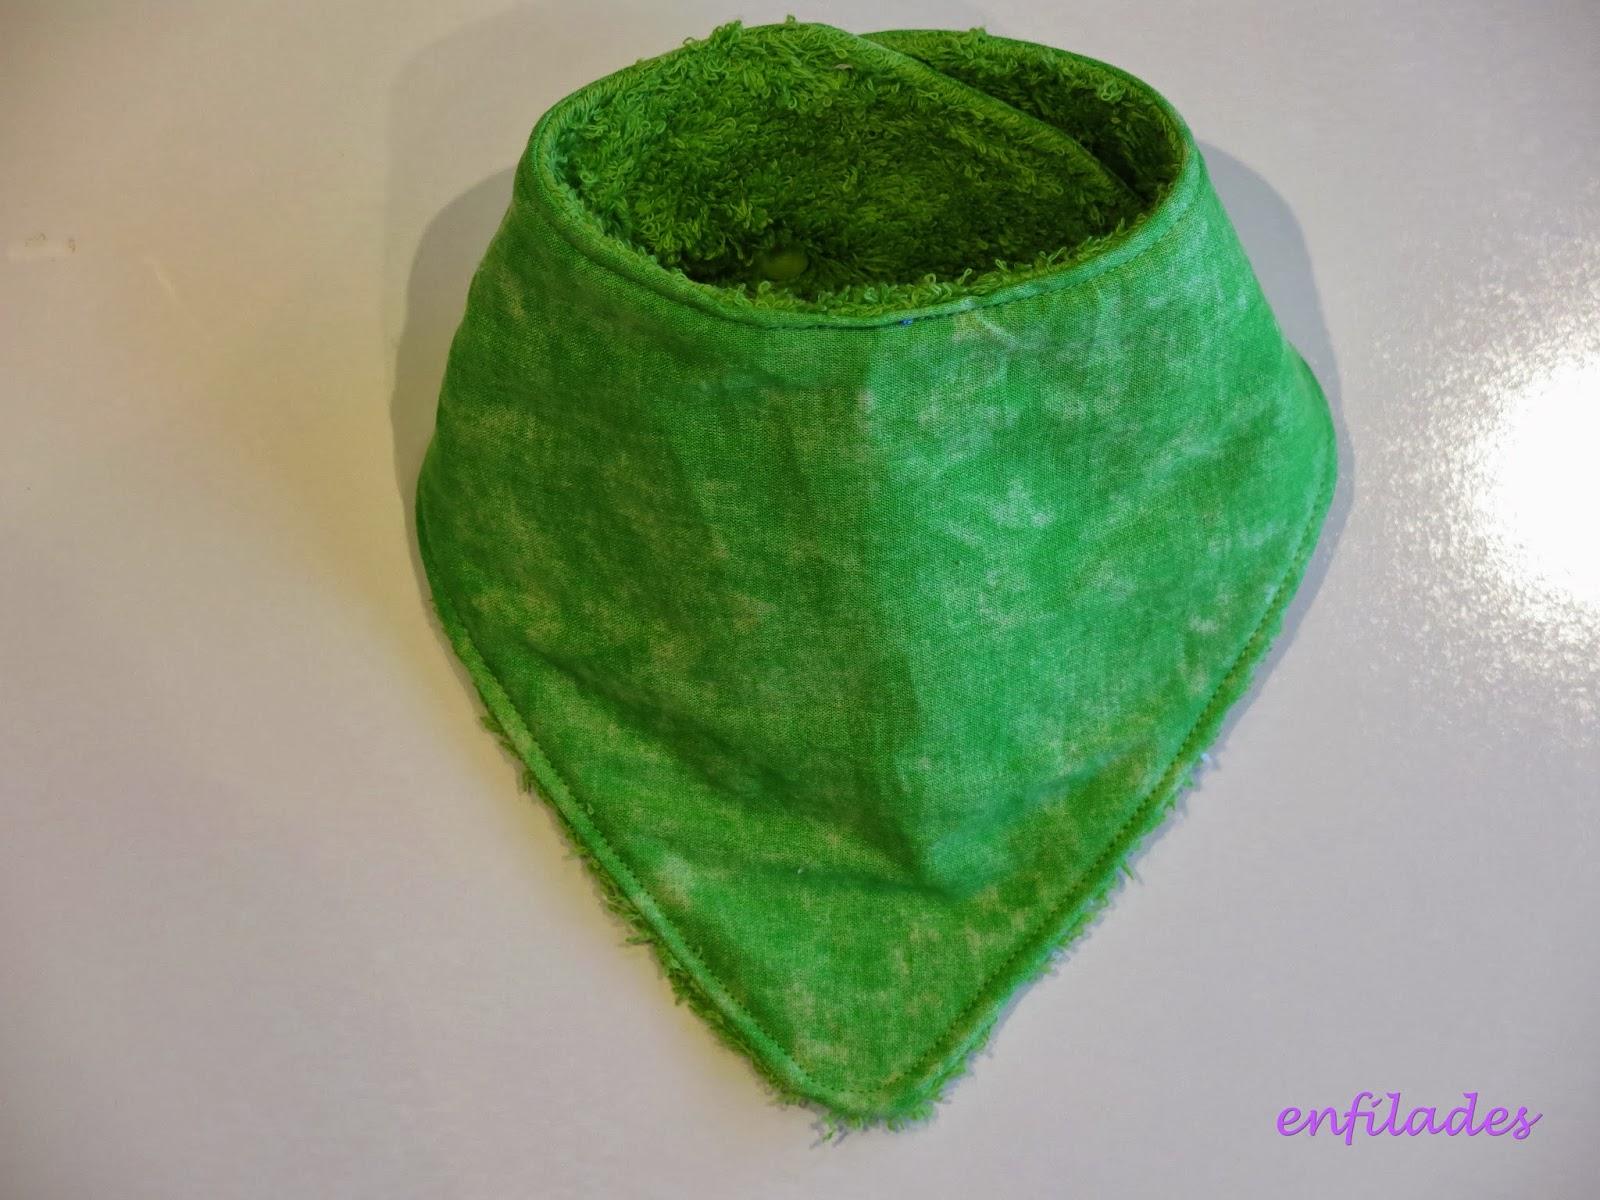 pitet bandana verd llima - serie Escola enfilades.cat